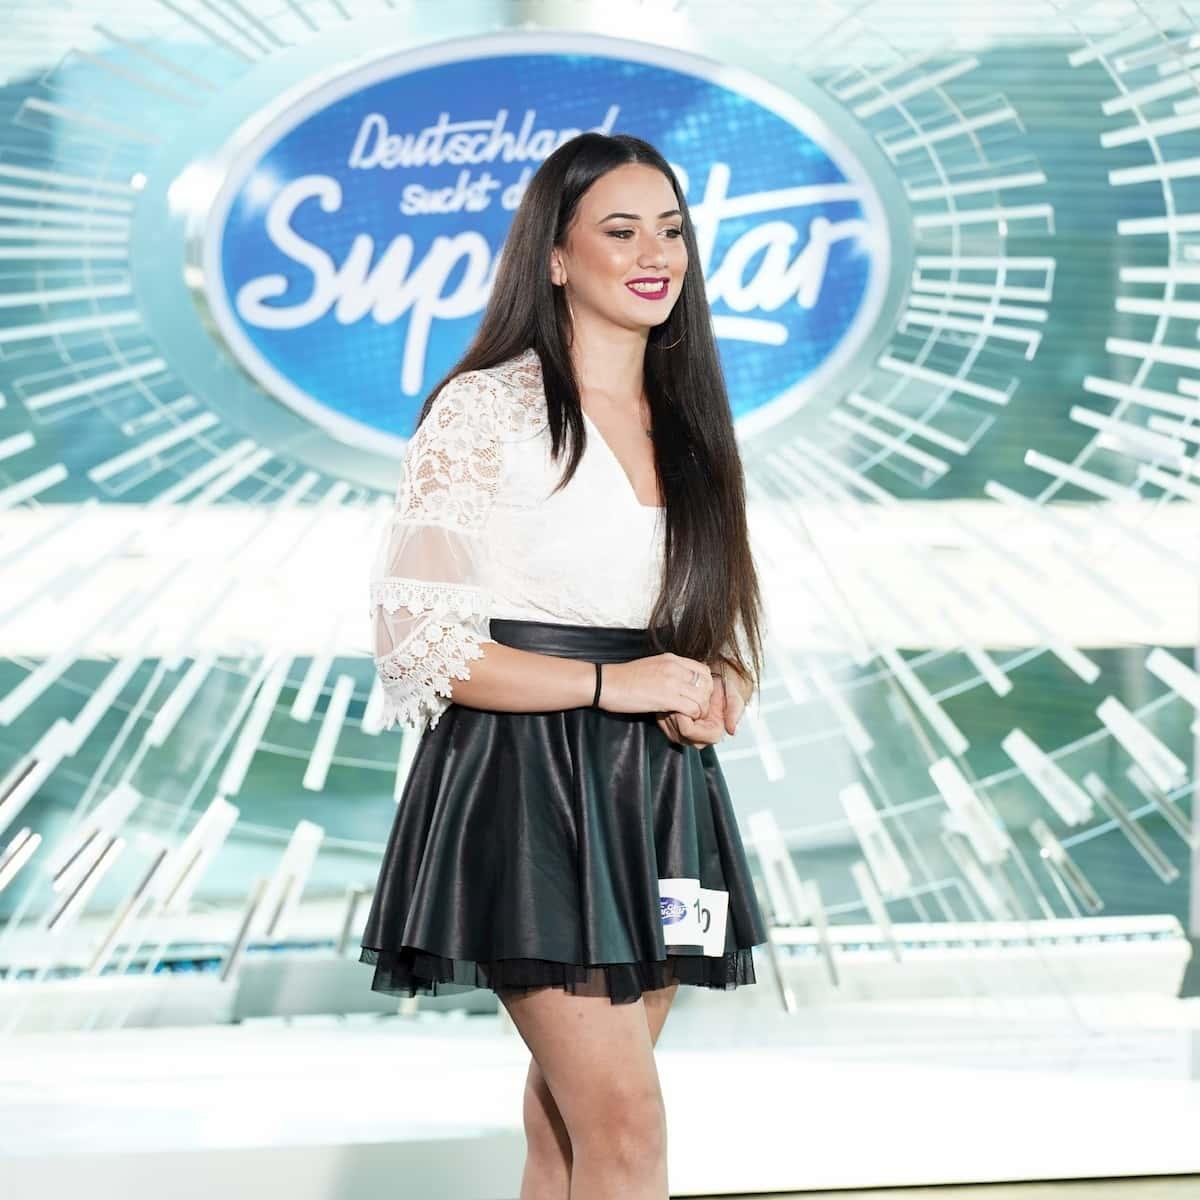 Chiara D'Amico bei DSDS am 1.2.2020 als Kandidatin